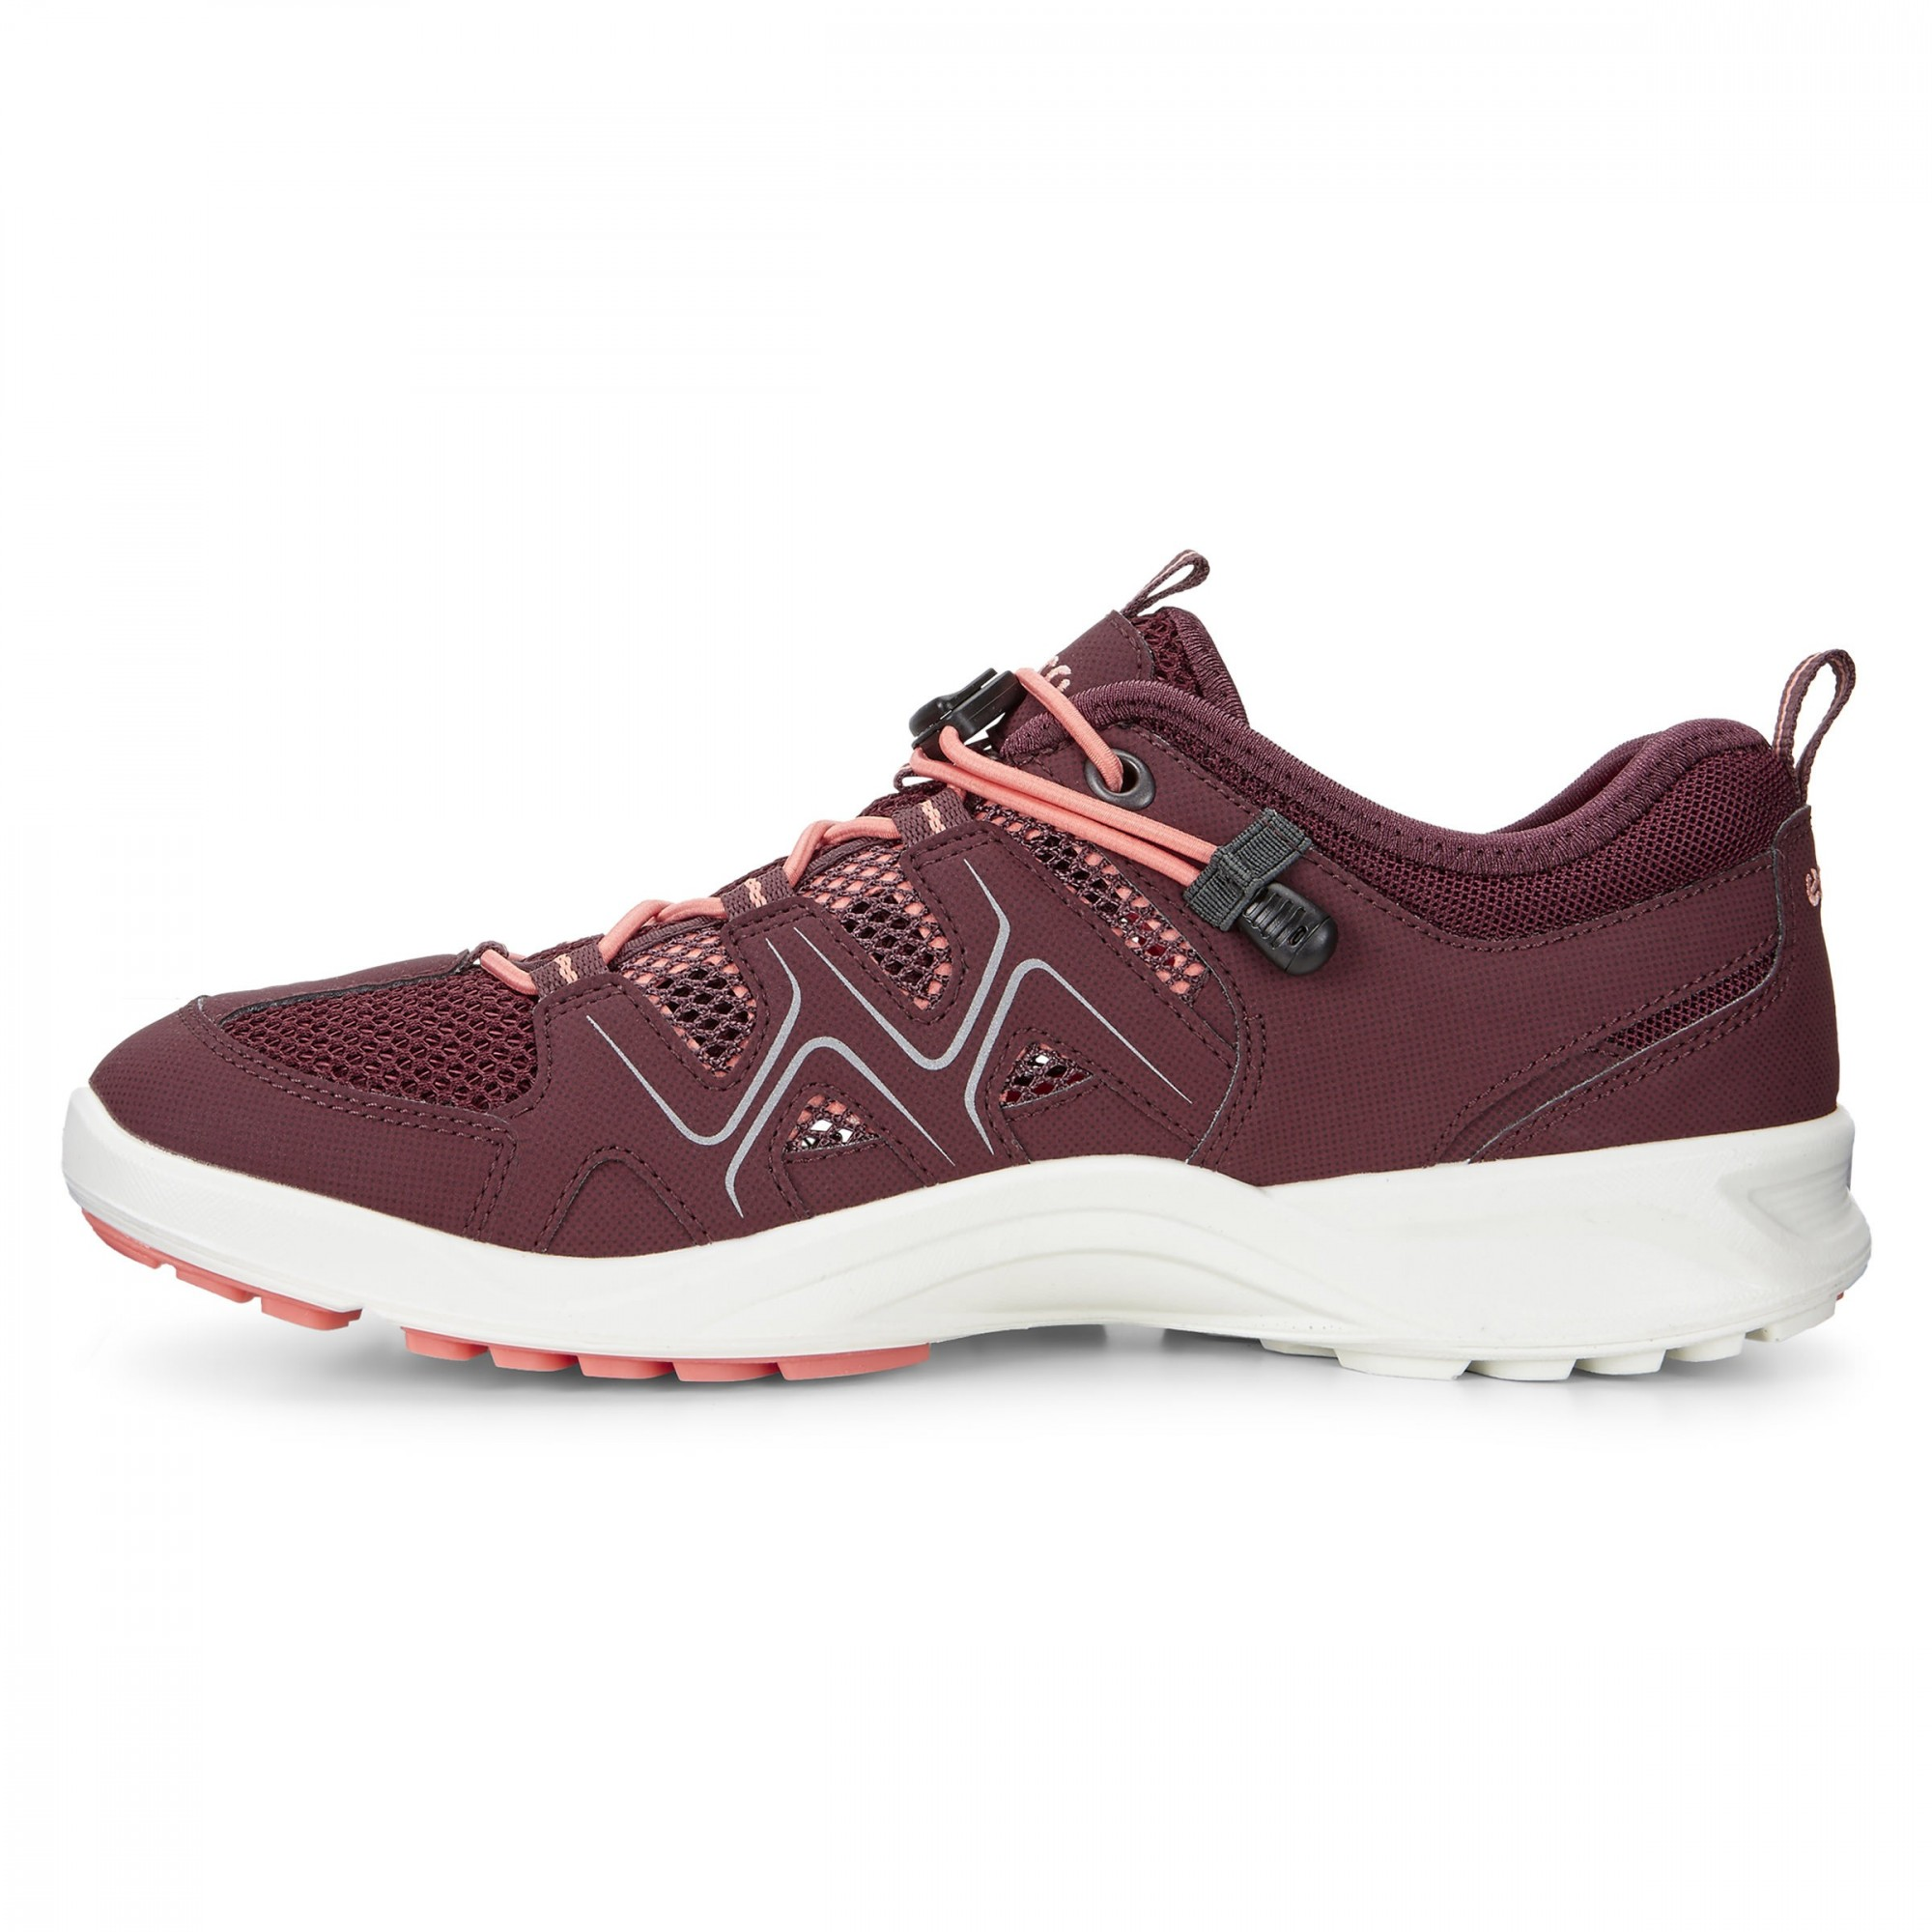 ECCO calzature, ECCO Schuhe, ECCO shoes, calzature ECCO